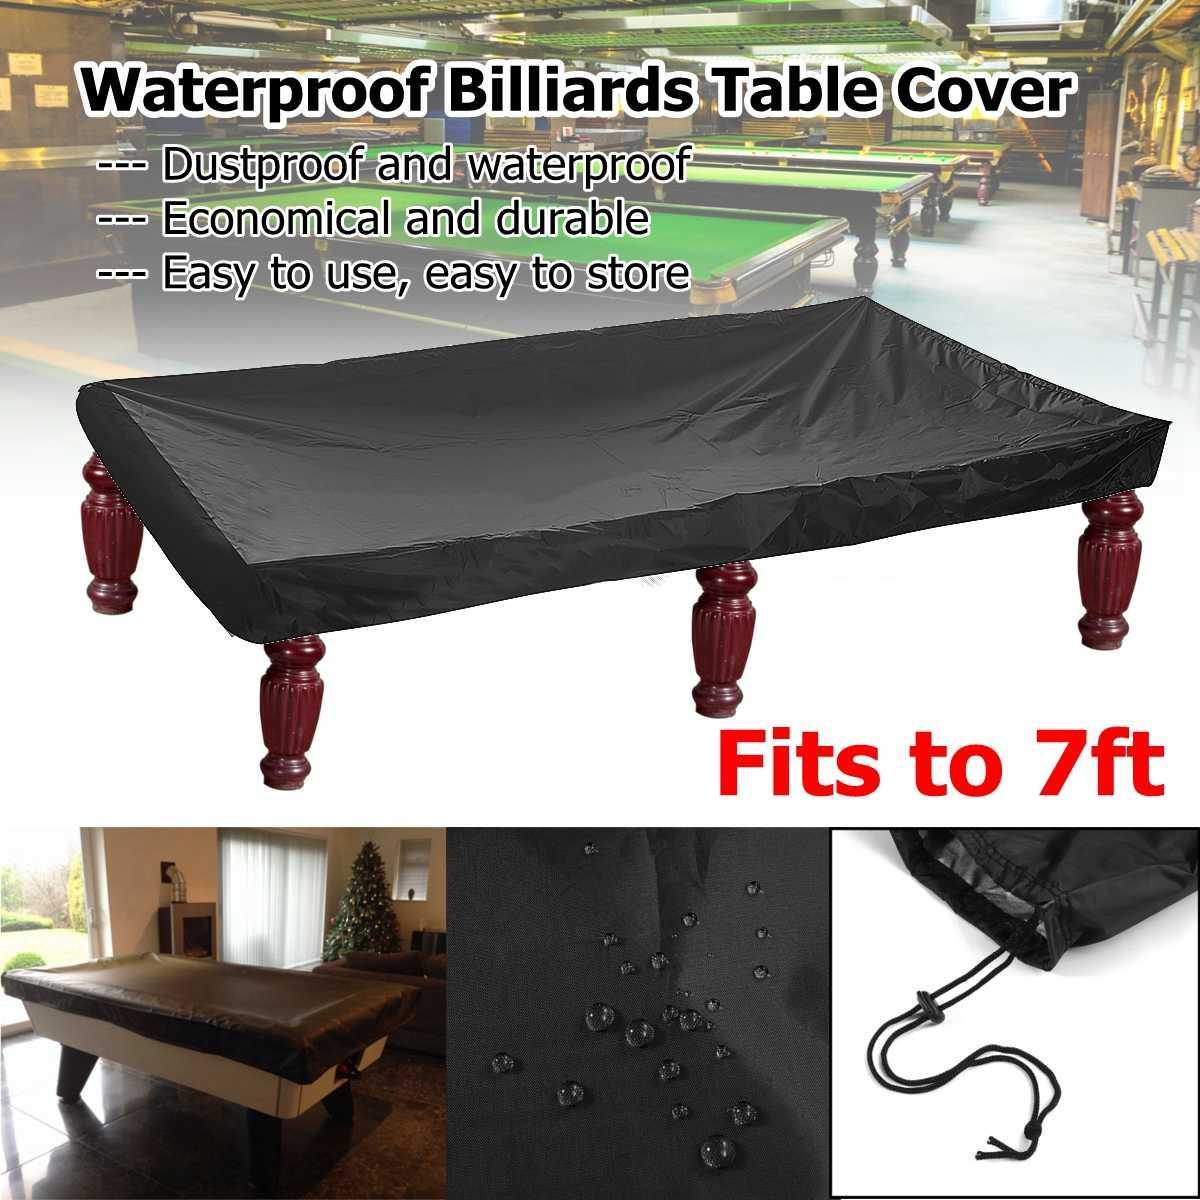 215x125x14cm PVC Table Billiard Cover Feet Billiard Tennis Table Cover R.ips Resistant Oxford Pool Table Billiard Cover